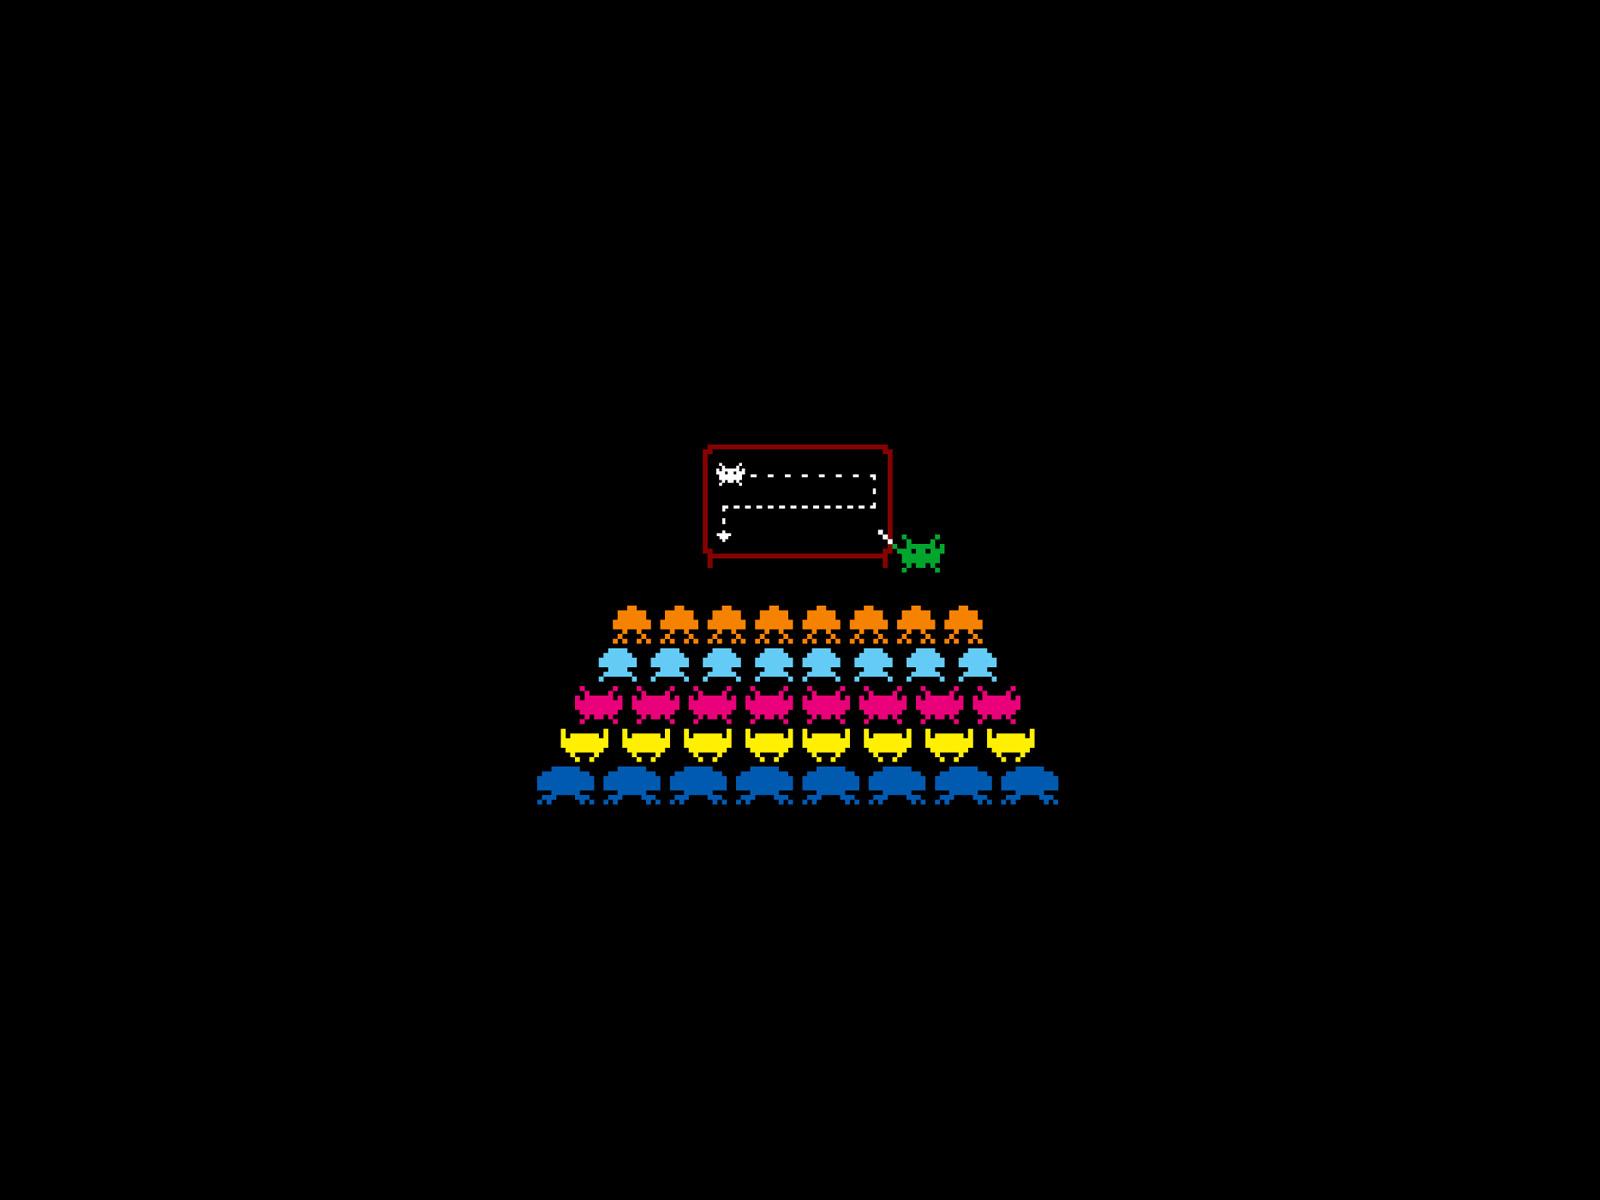 Fnatic Wallpaper Iphone Hd Arcade Background Pixelstalk Net